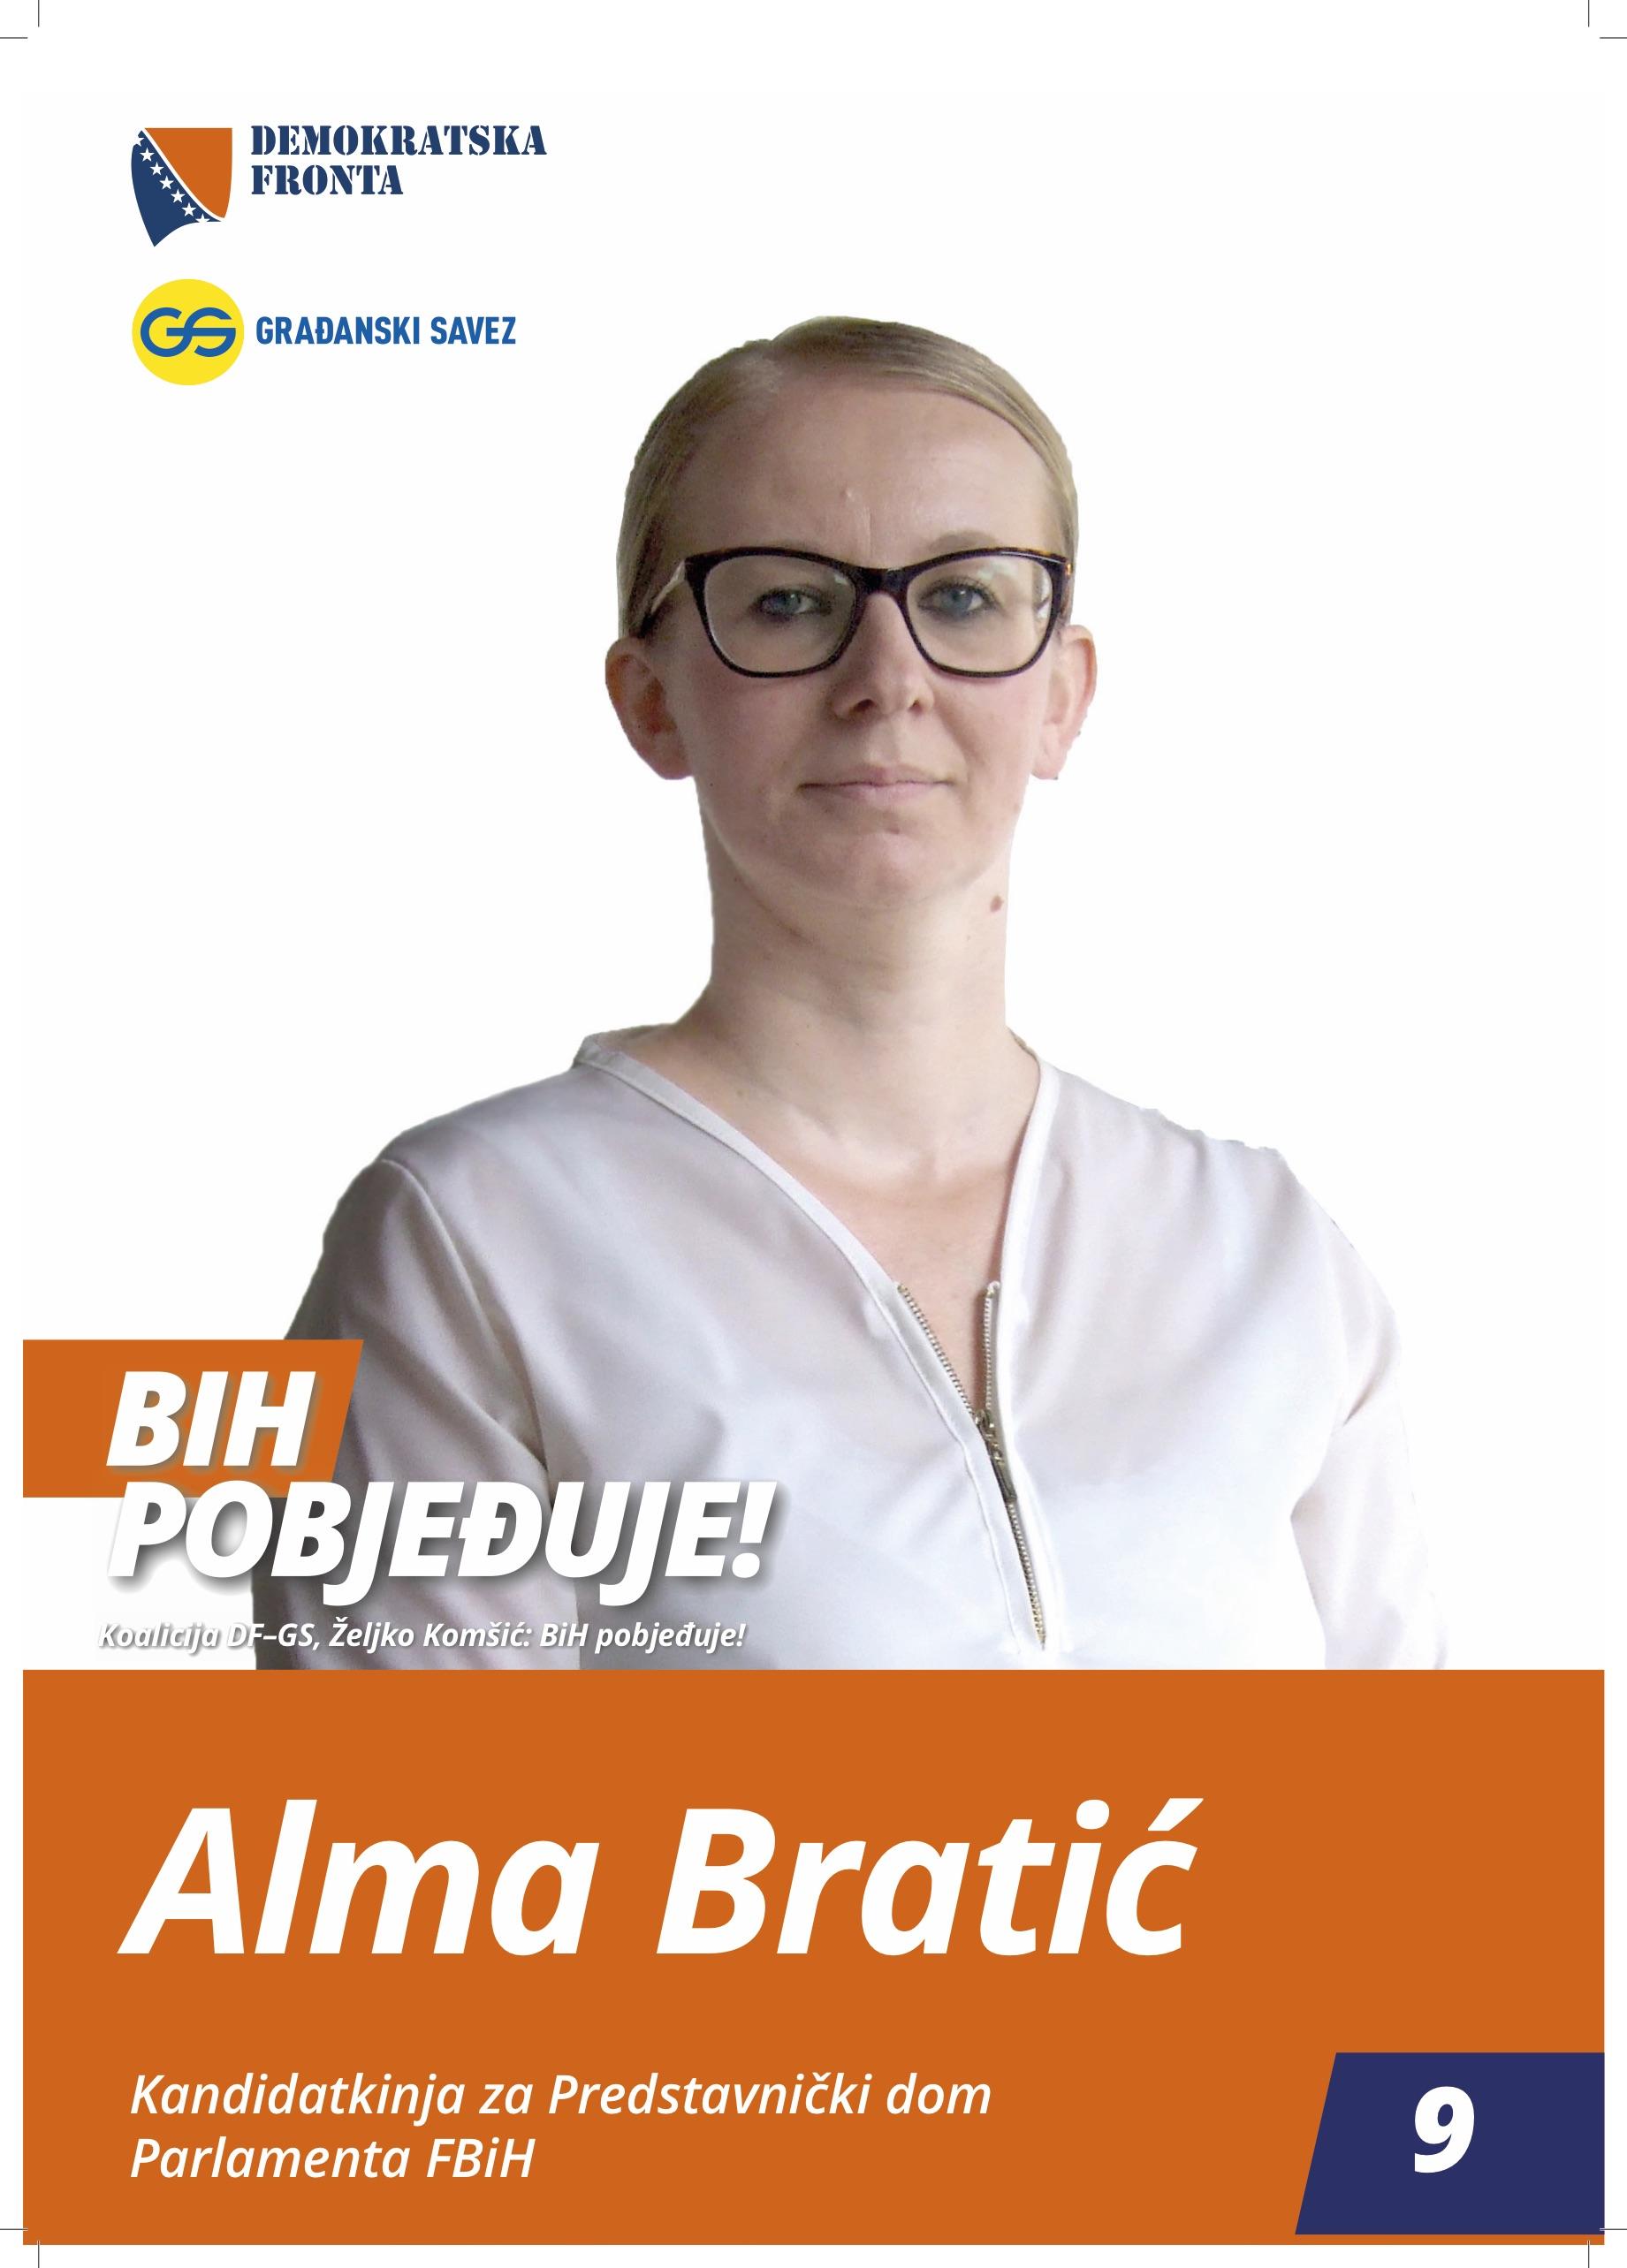 Alma Bratić, diplomirani pravnik